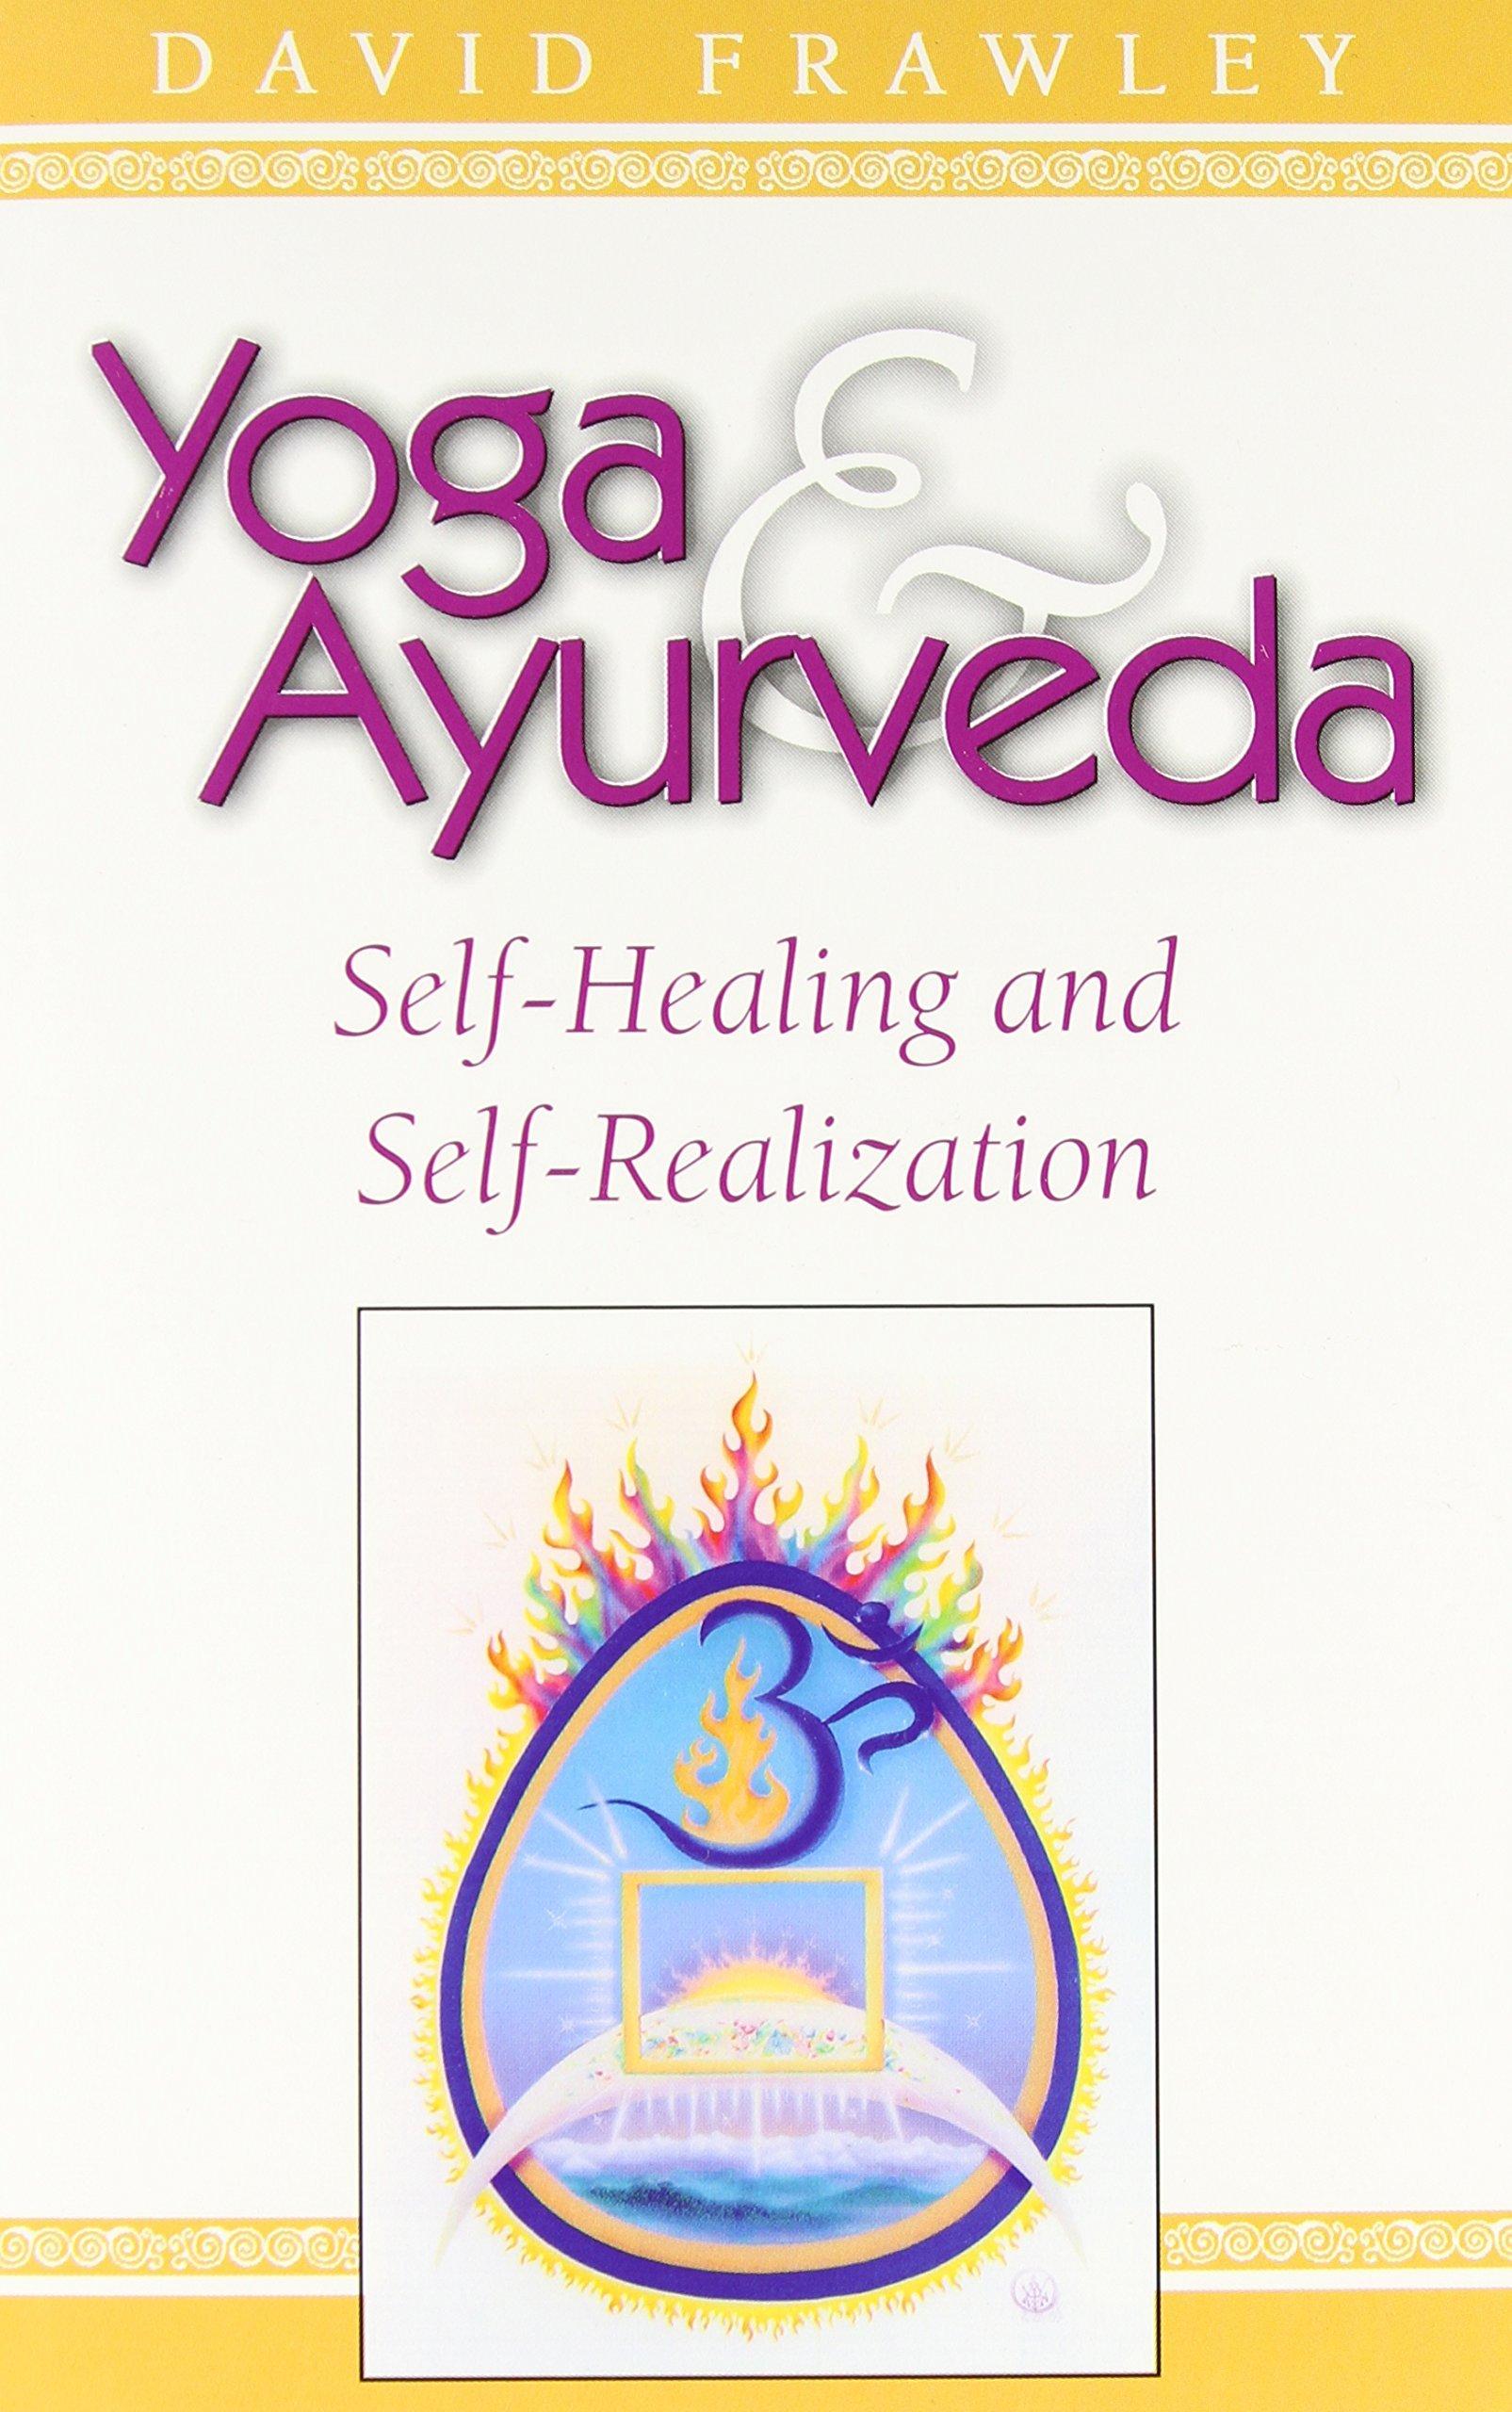 Yoga and Ayurveda: Self-Healing and Self-Realization (Dr. David Frawley)